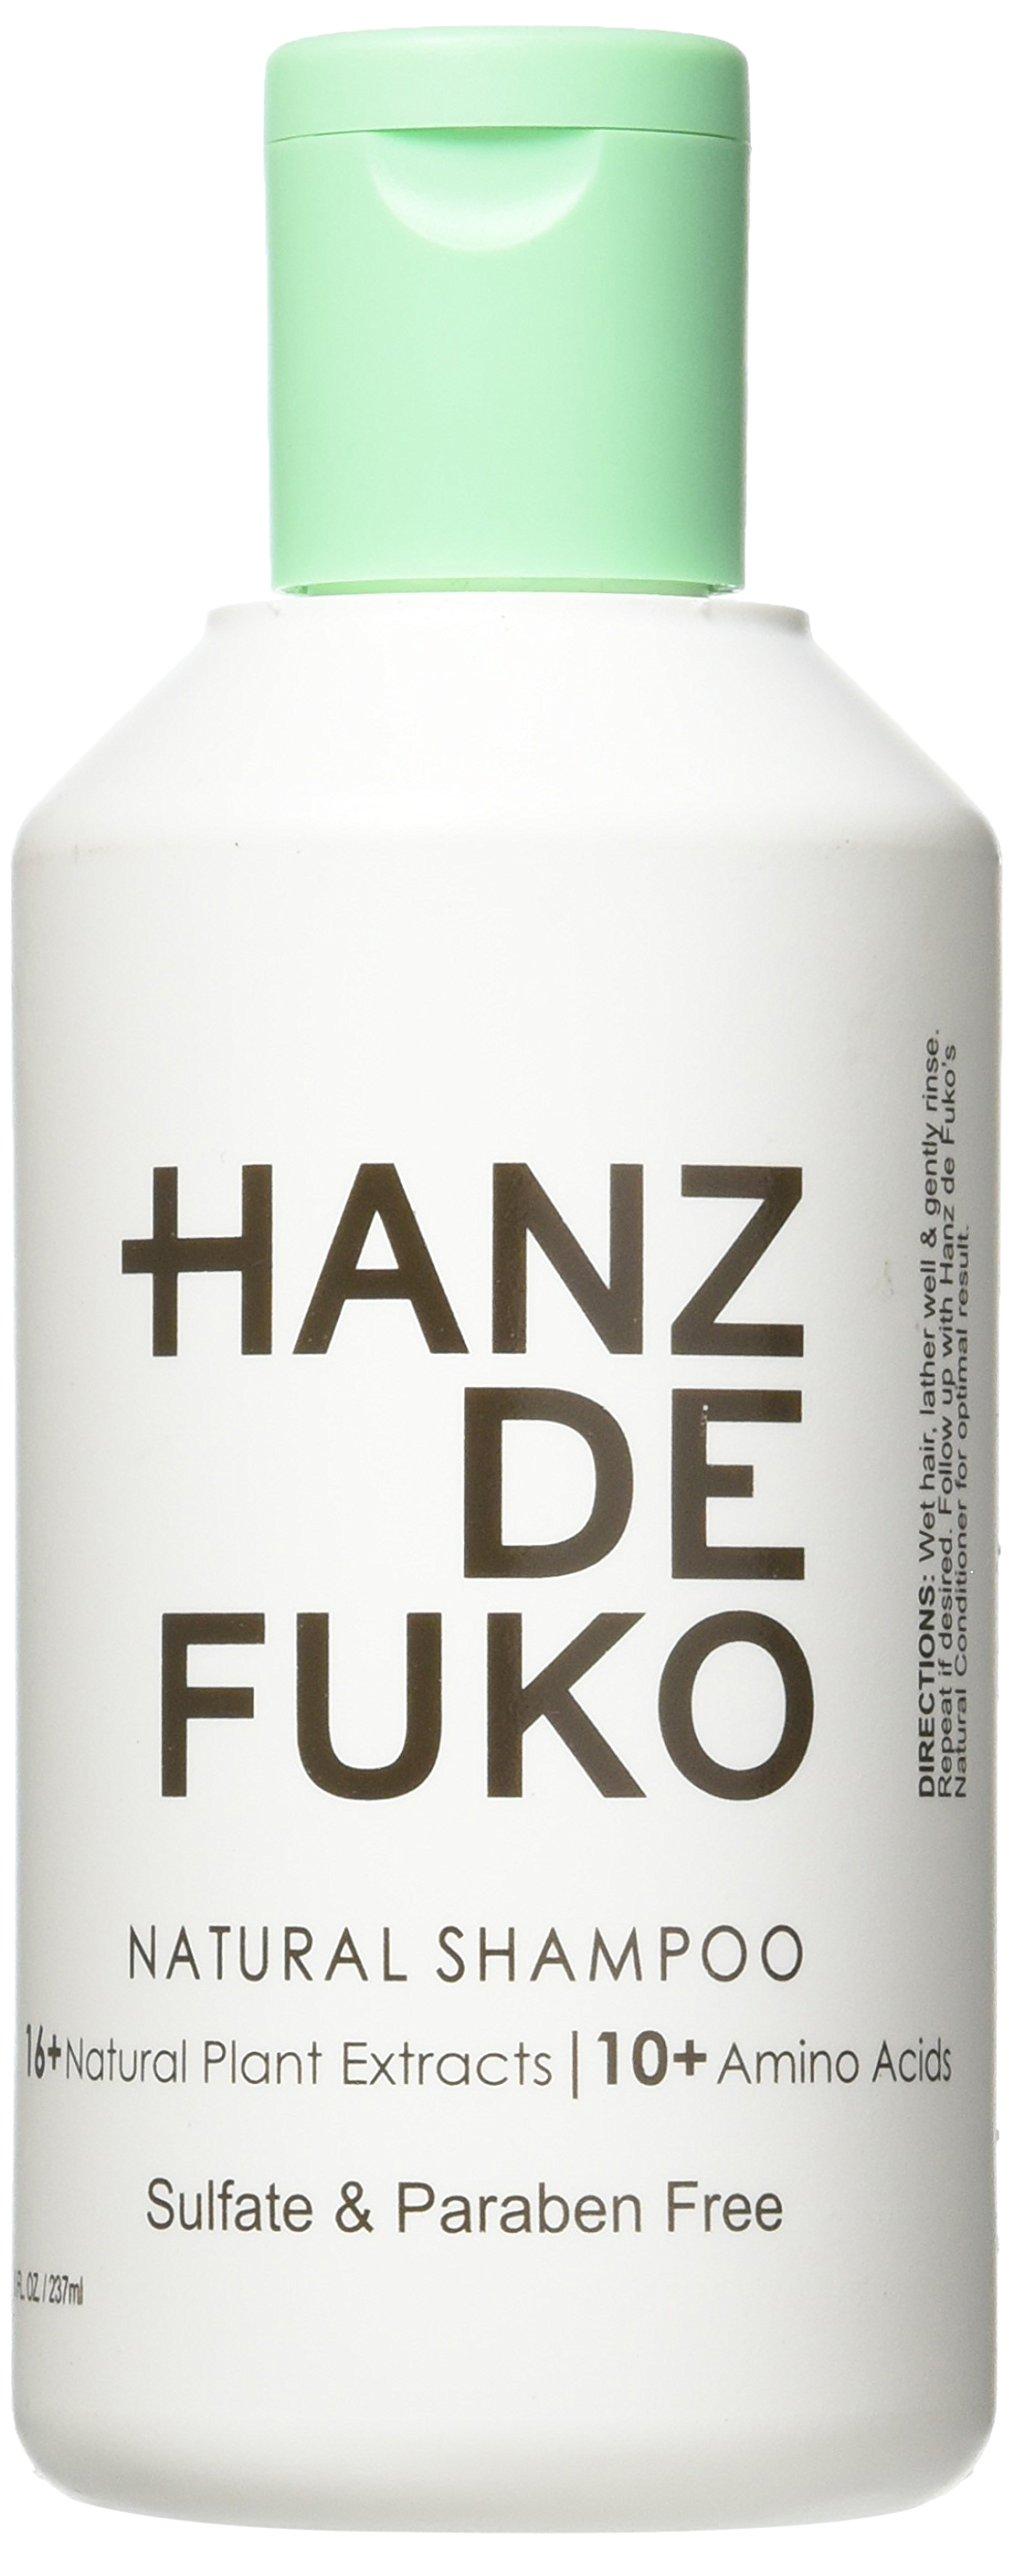 HANZ DE FUKO Natural Hair Shampoo 8 Fl oz Sulfate & Paraben Free